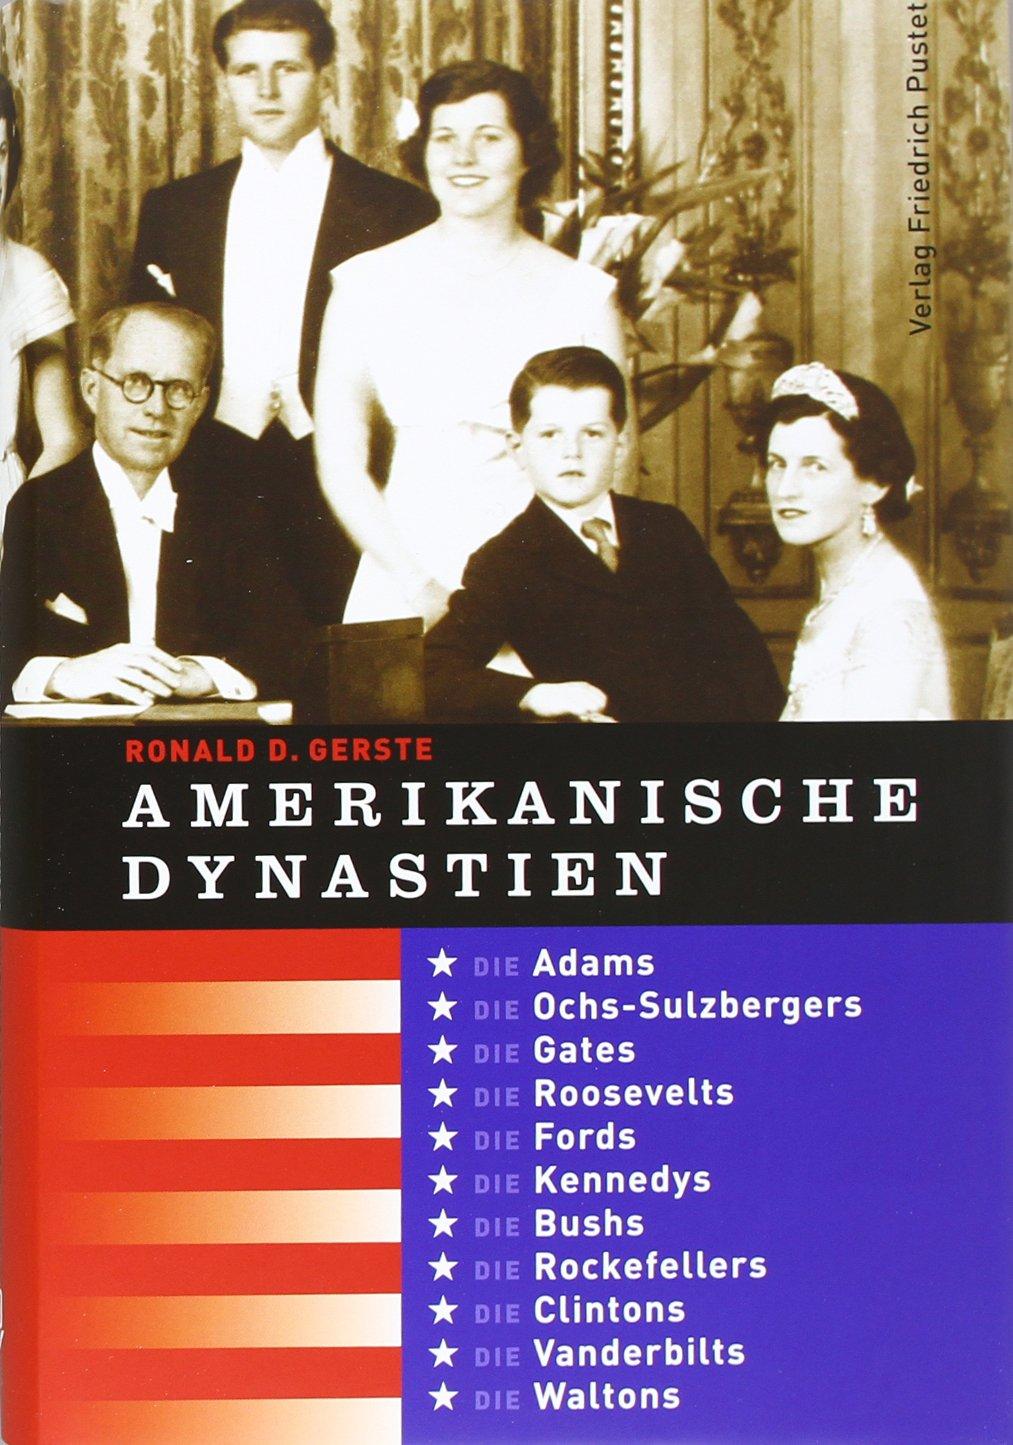 Amerikanische Dynastien: Die Adams, Ochs-Sulzbergers, Gates, Roosevelts, Fords, Kennedys, Bushs, Rockefellers, Clintons, Vanderbilts, Waltons